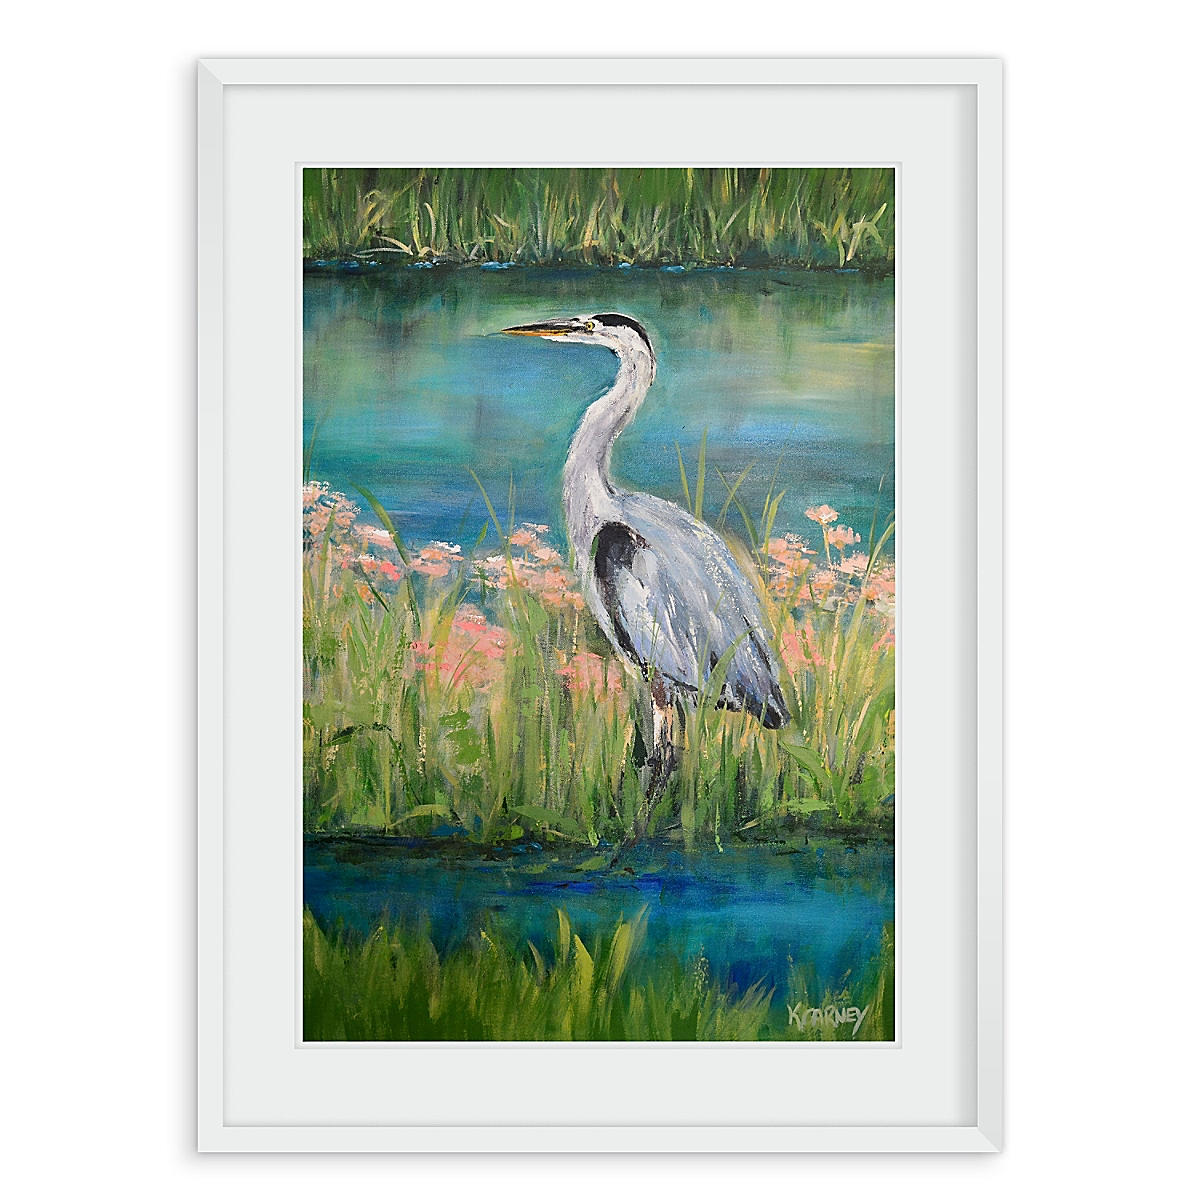 "Heron Cove 24 x 36""H"